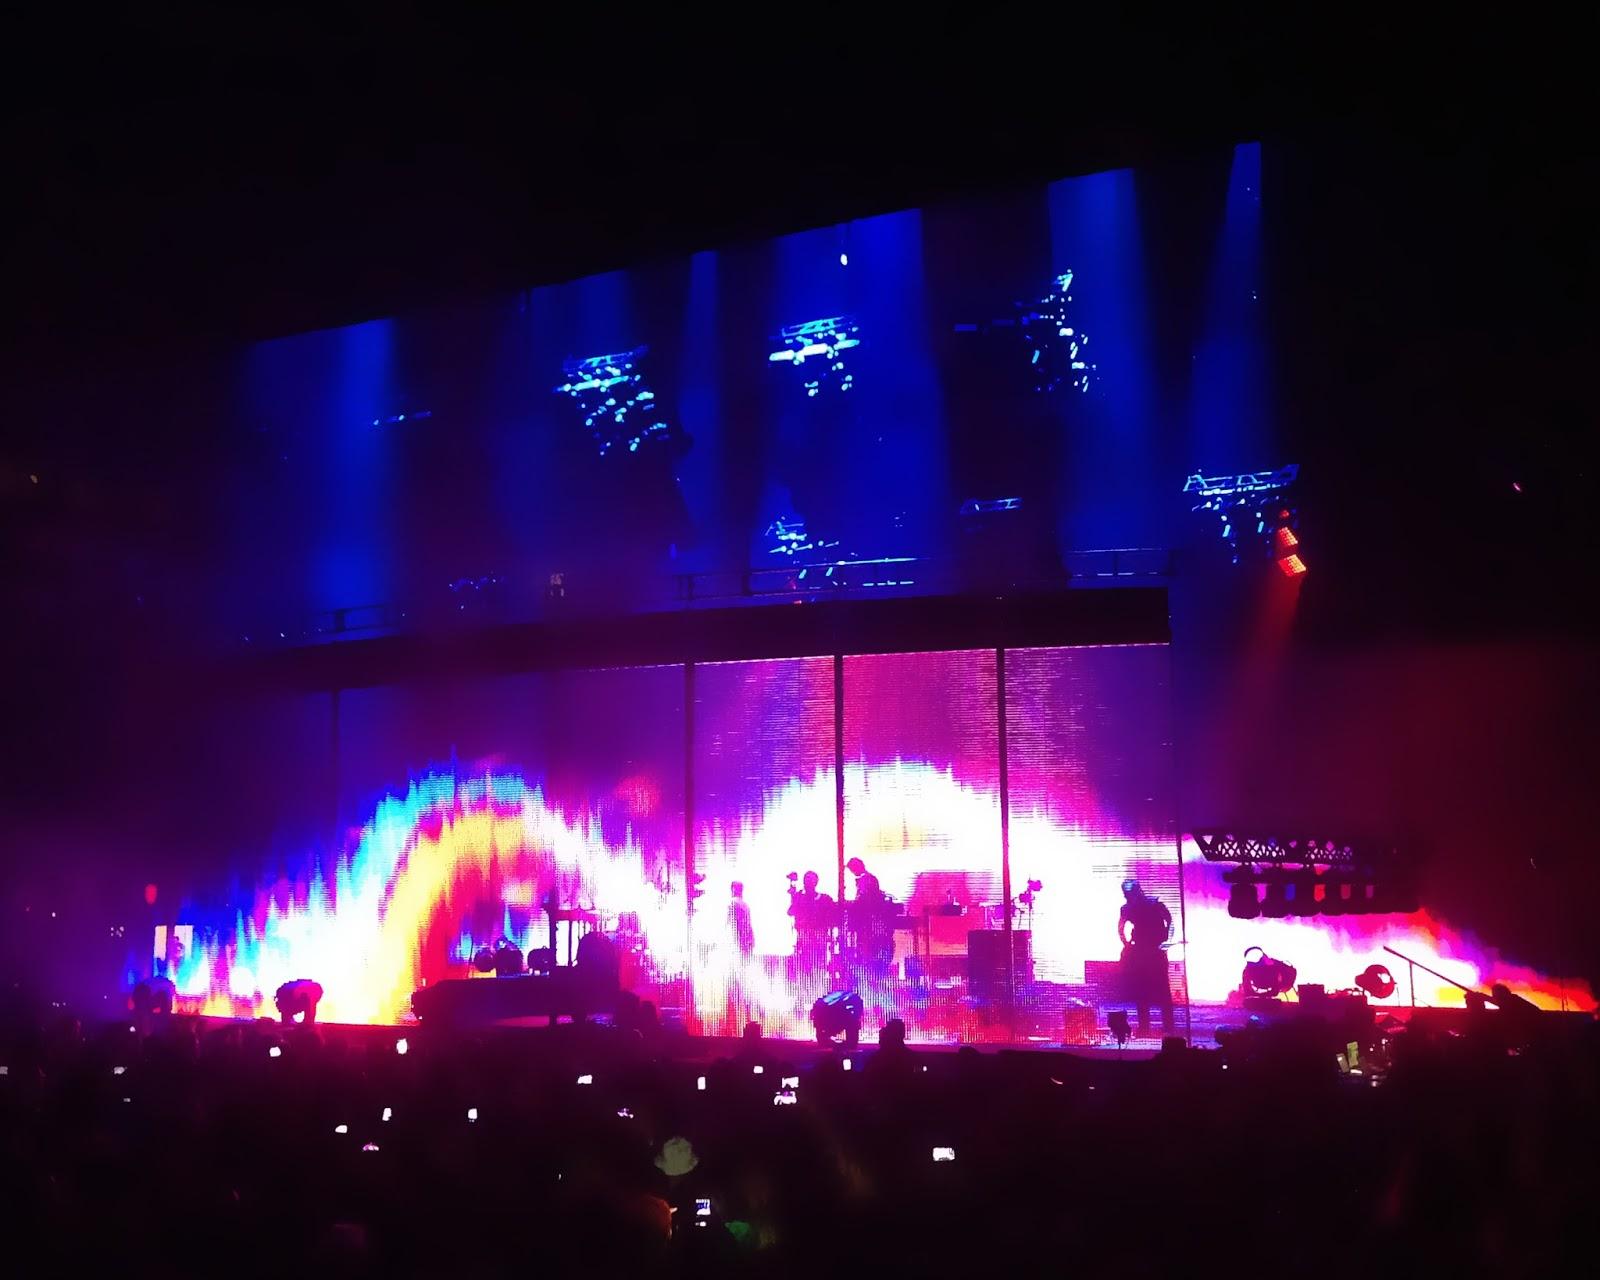 Nine Inch Nails in Orlando at Amway Center | Scorpyorising